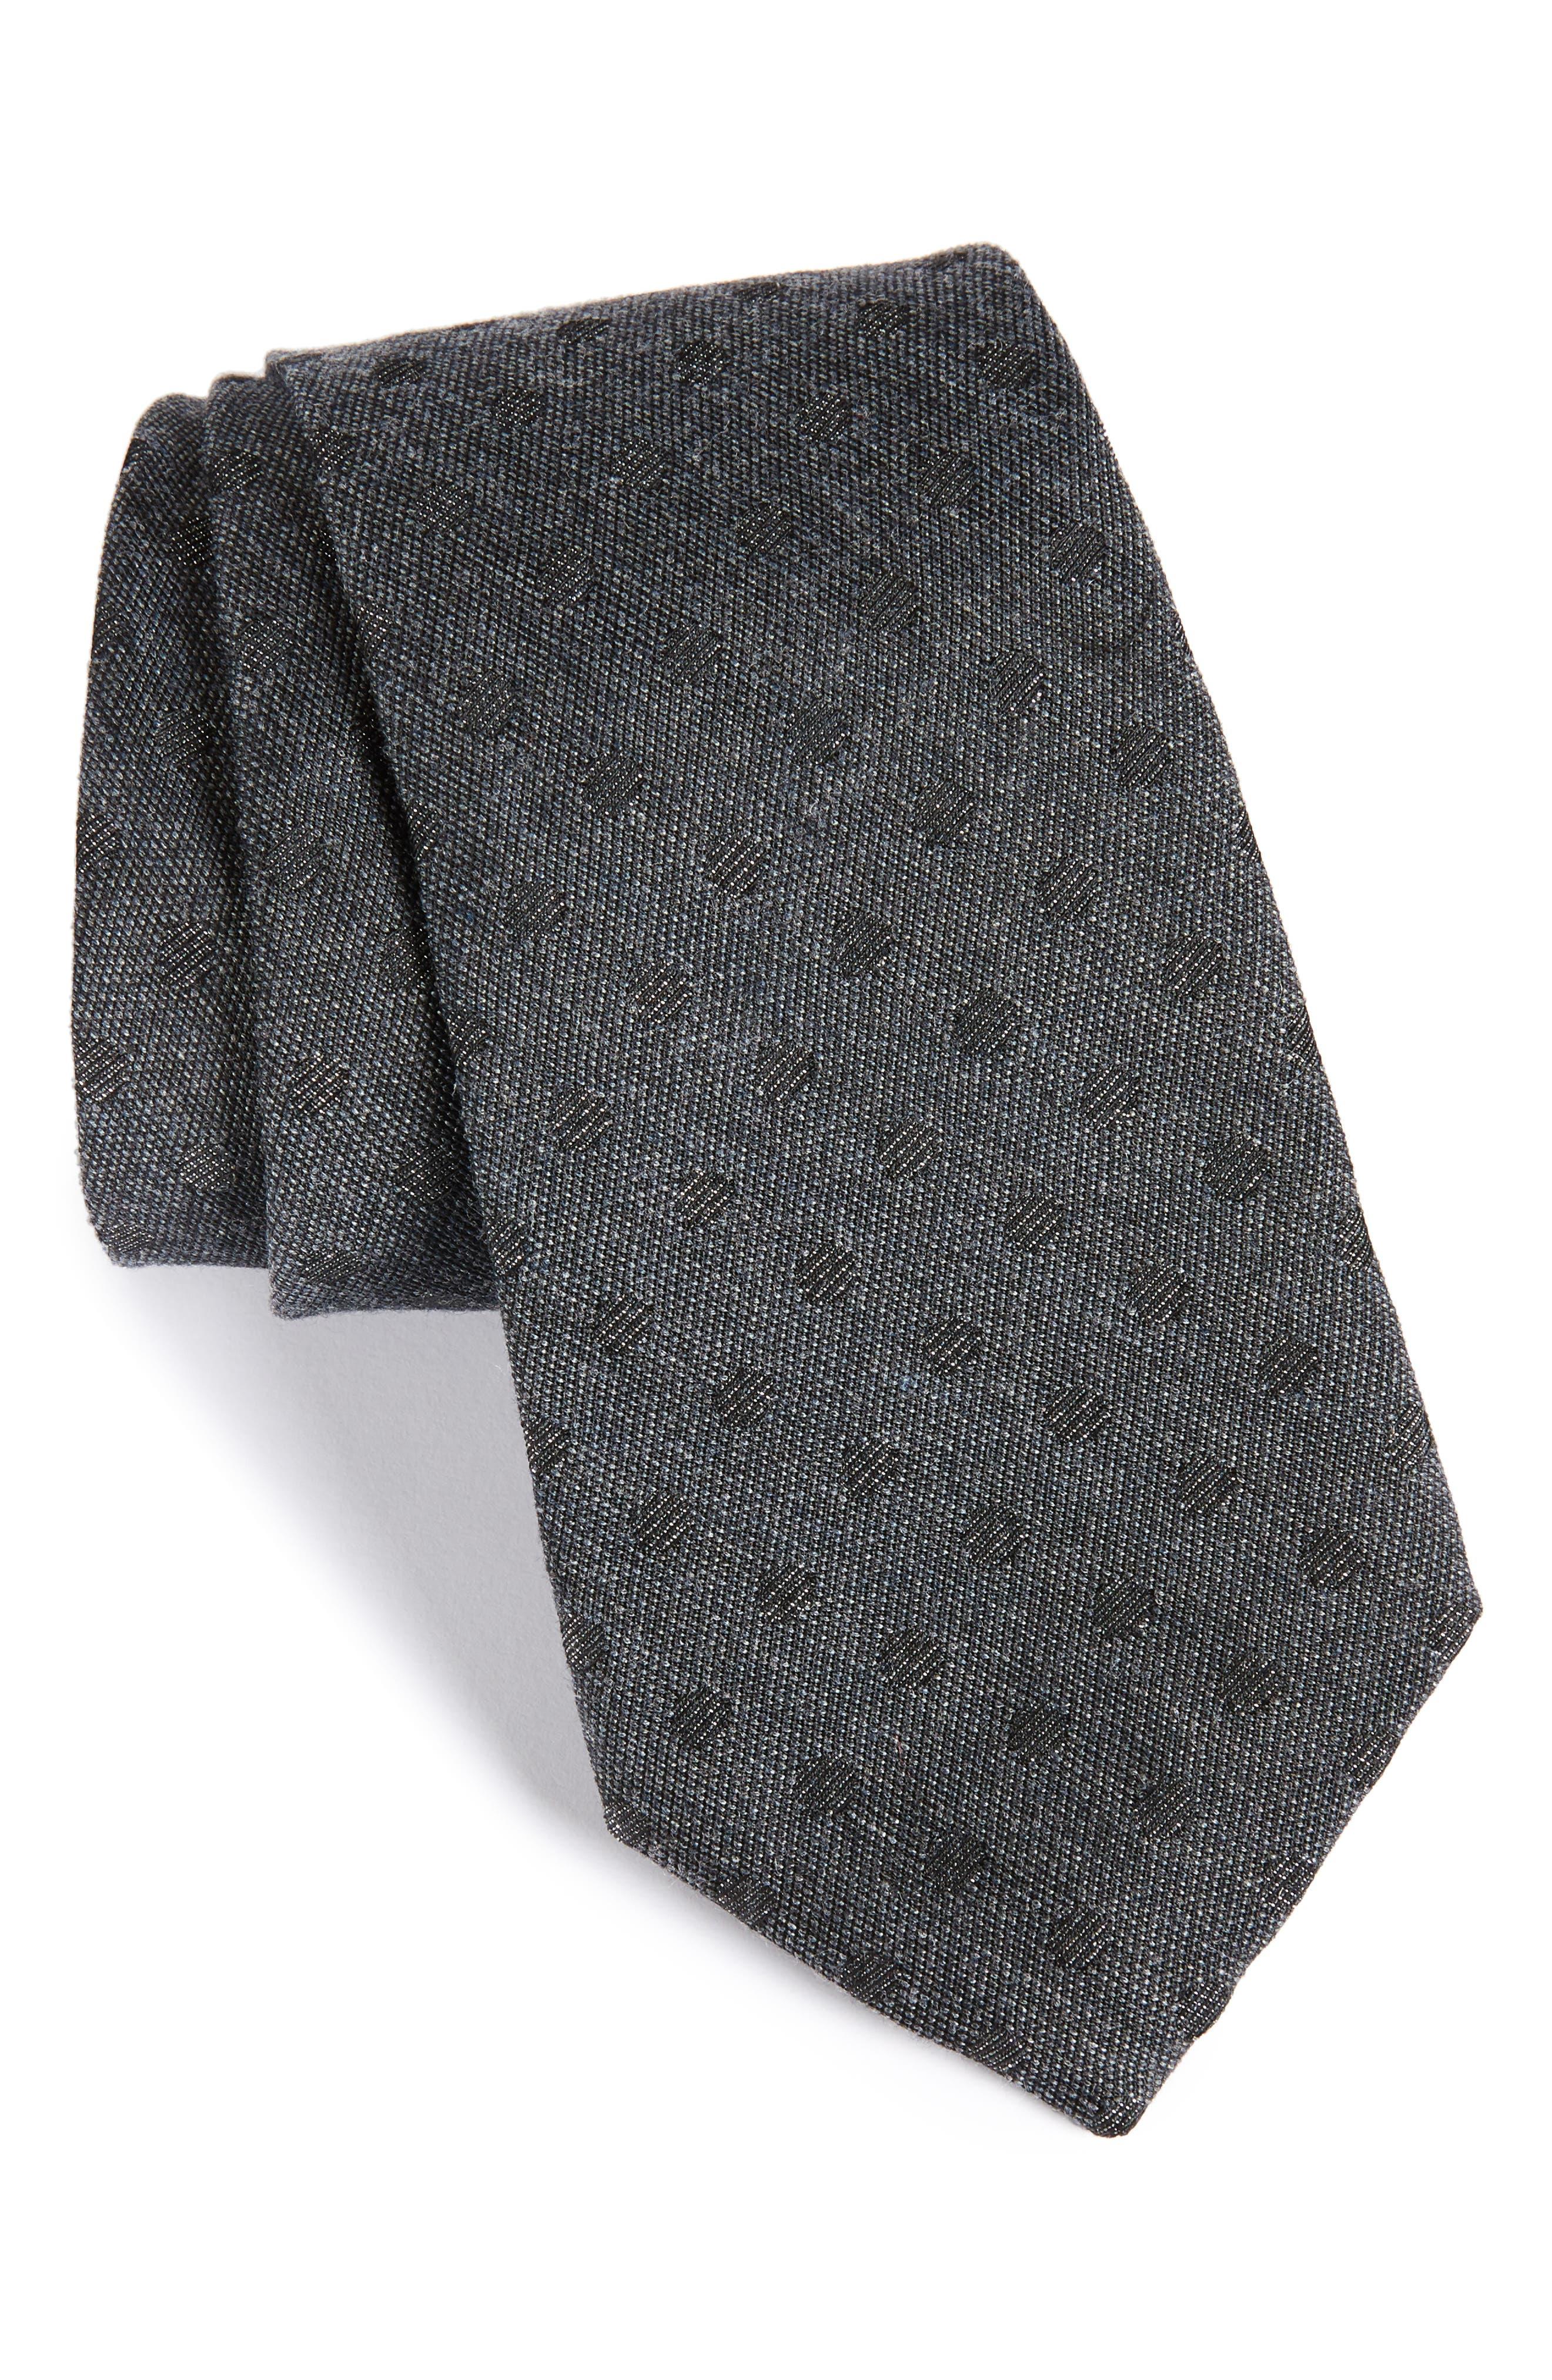 Lang Dot Tie,                         Main,                         color, 001